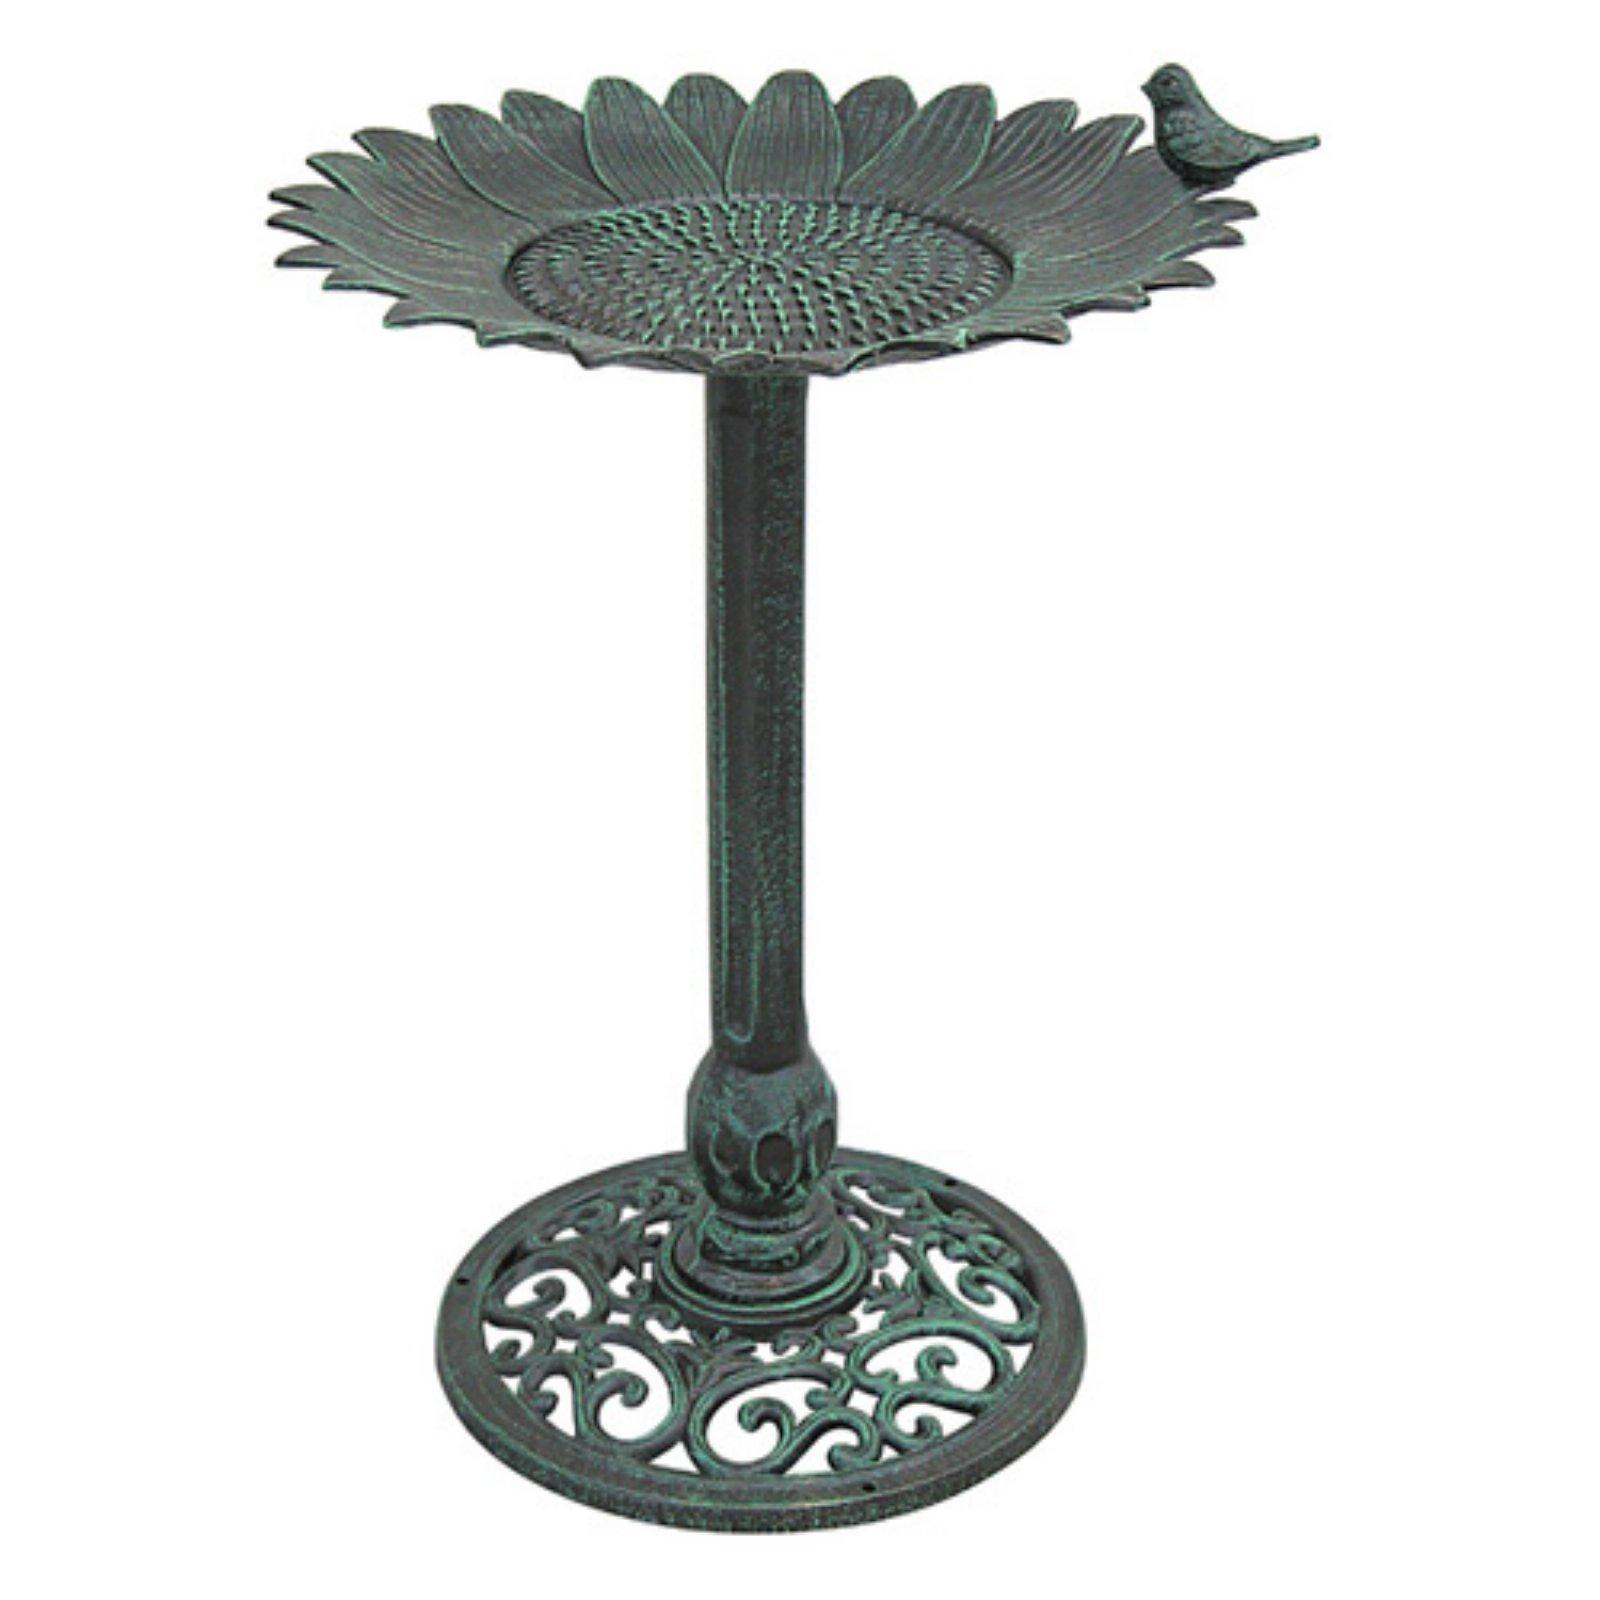 Innova Sunflower with Sitting Bird Metal Bird Bath - Verdigris Green